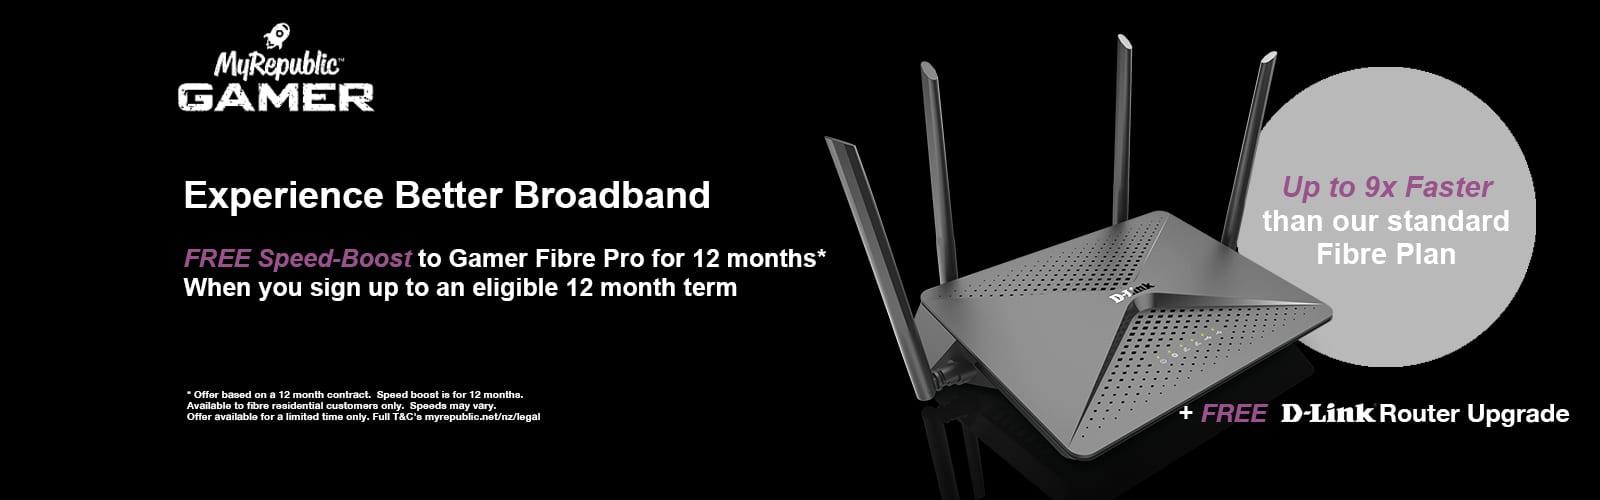 Super Fast Unlimited Fibre & VDSL Internet | MyRepublic New